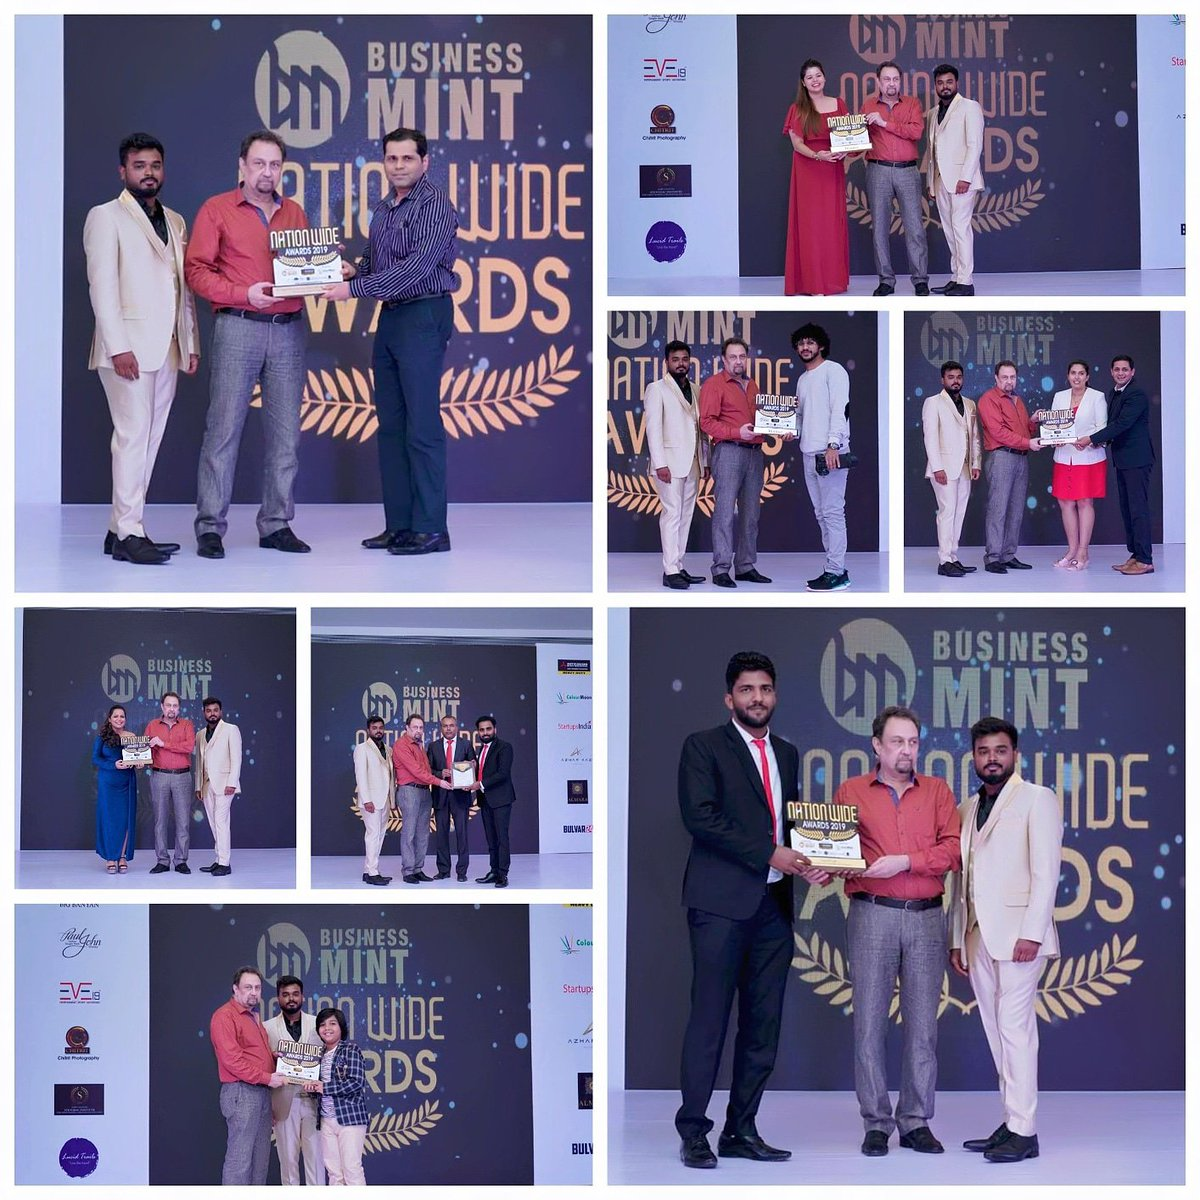 #businessawards #awardsceremony #awardsnight #entrepreneur #businessmint #nationwideawards #hyderabad #businessideas #networkmarketing #businesstip #womenempowerment #womenhelpingwomen #indiabusinessawards #indiabusinessawardpic.twitter.com/oBY5NbBB4m